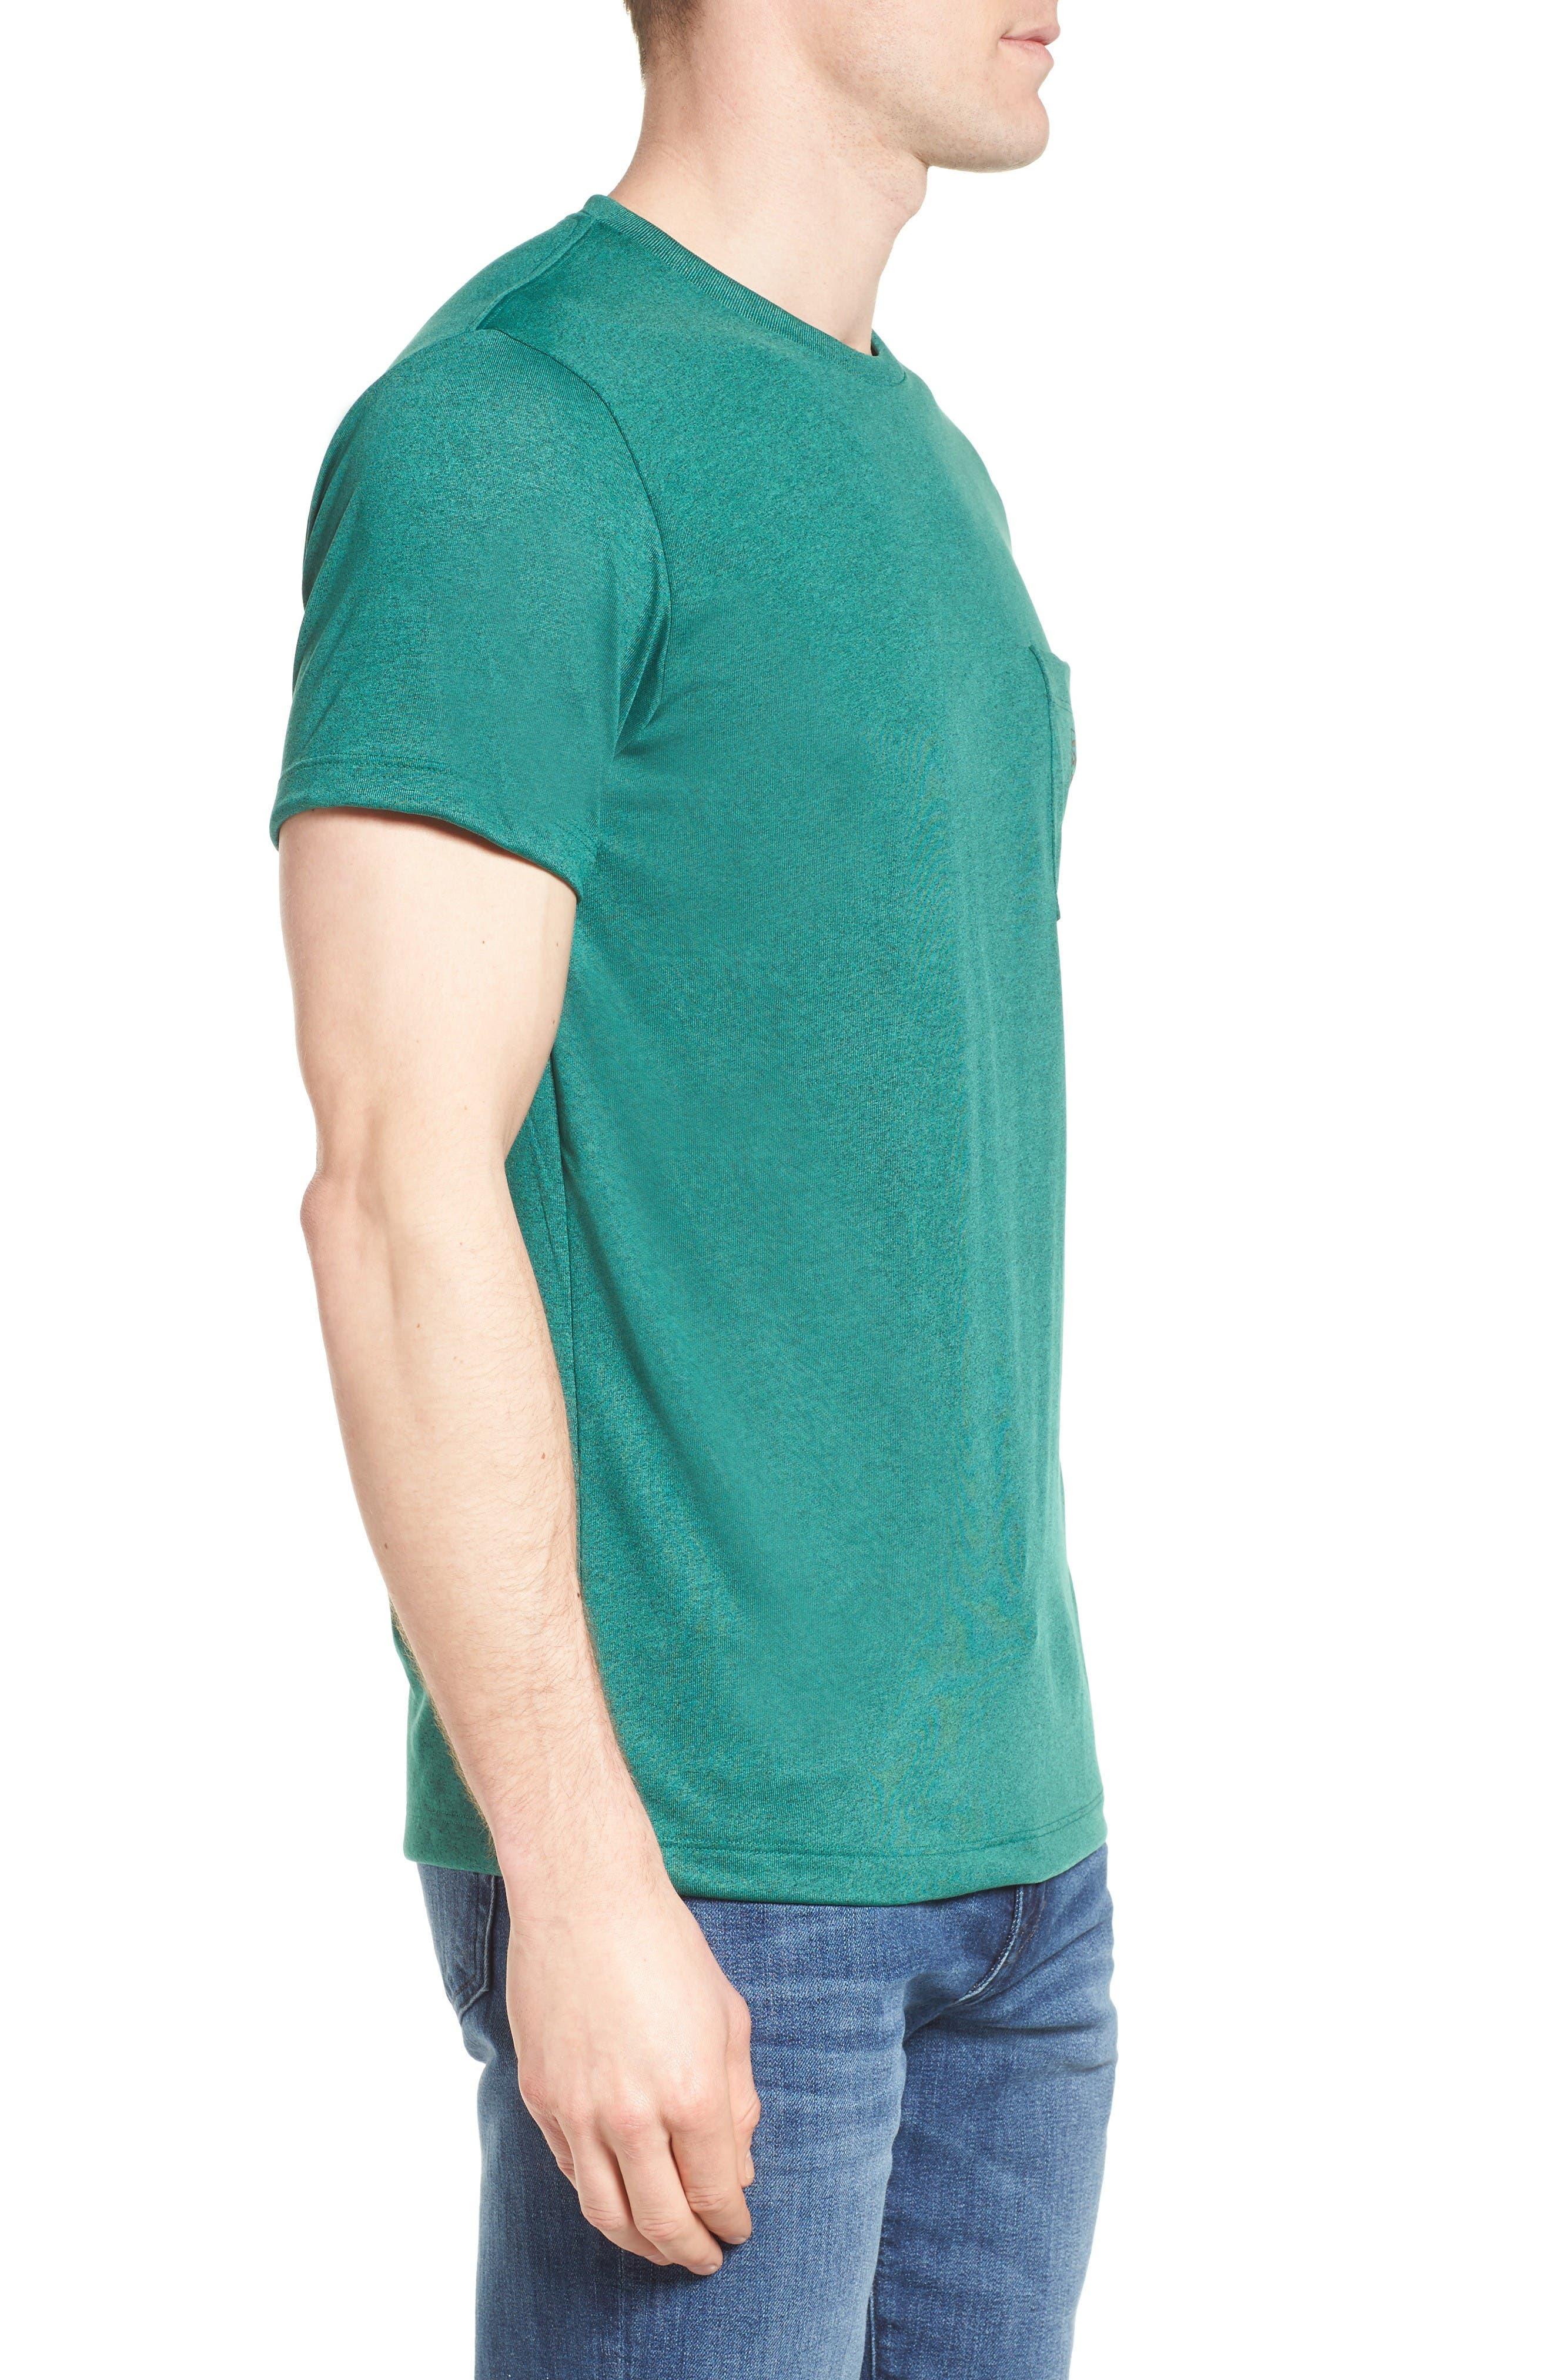 '73 Logo Slim Fit T-Shirt,                             Alternate thumbnail 3, color,                             Gem Green